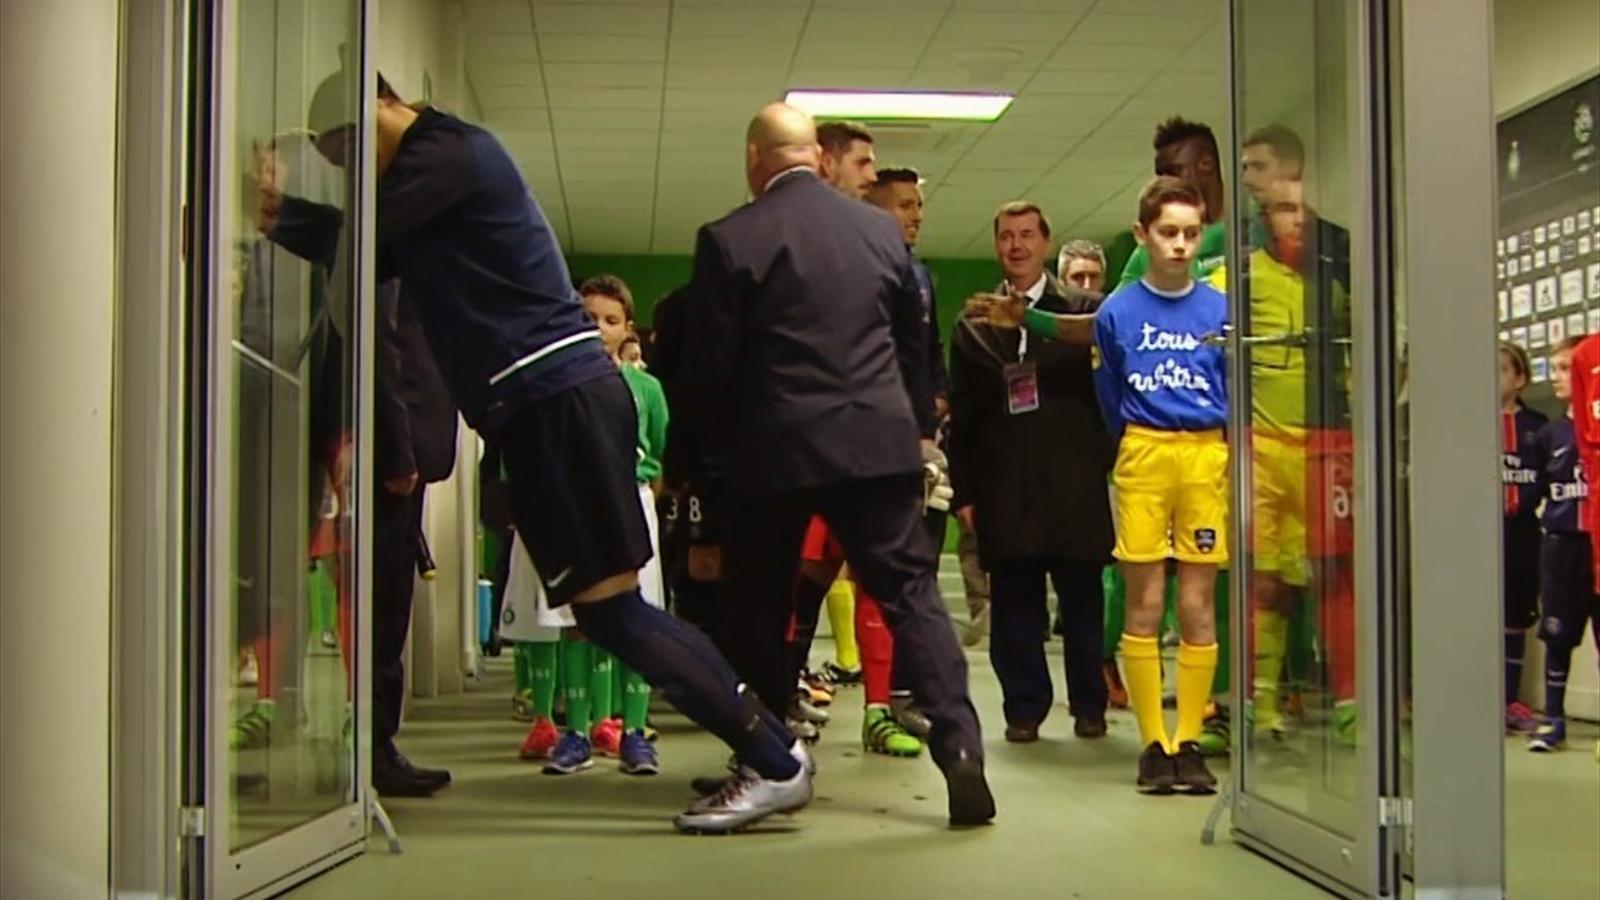 Zlatan Ibrahimovic stretches against a door (screenshot)